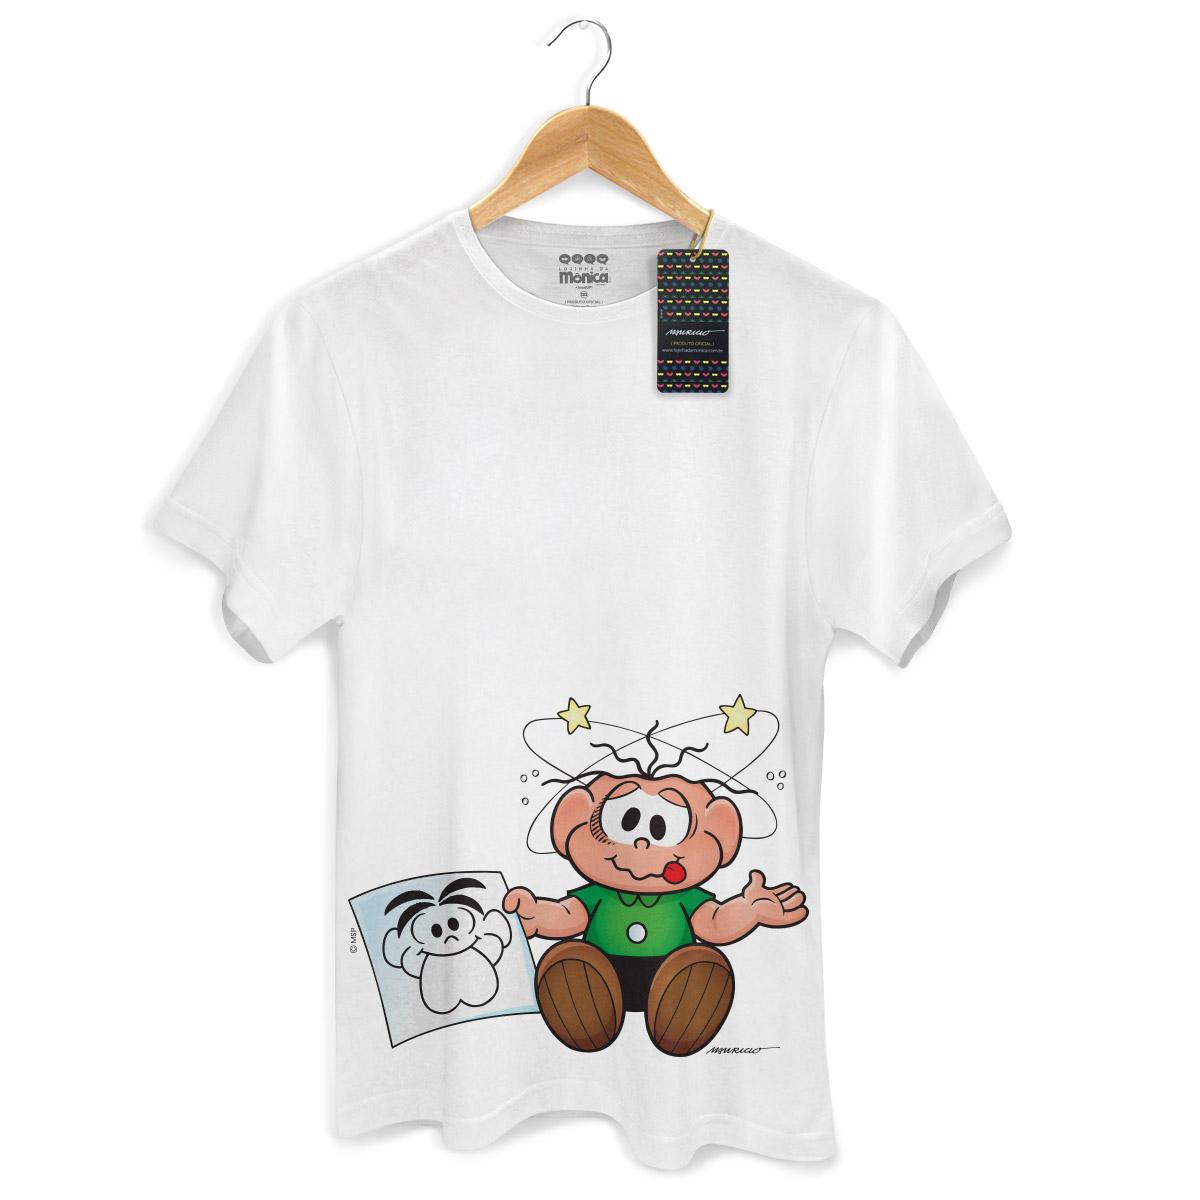 Camiseta Masculina Turma Da Mônica Kids O Cebolinha Apanhou!